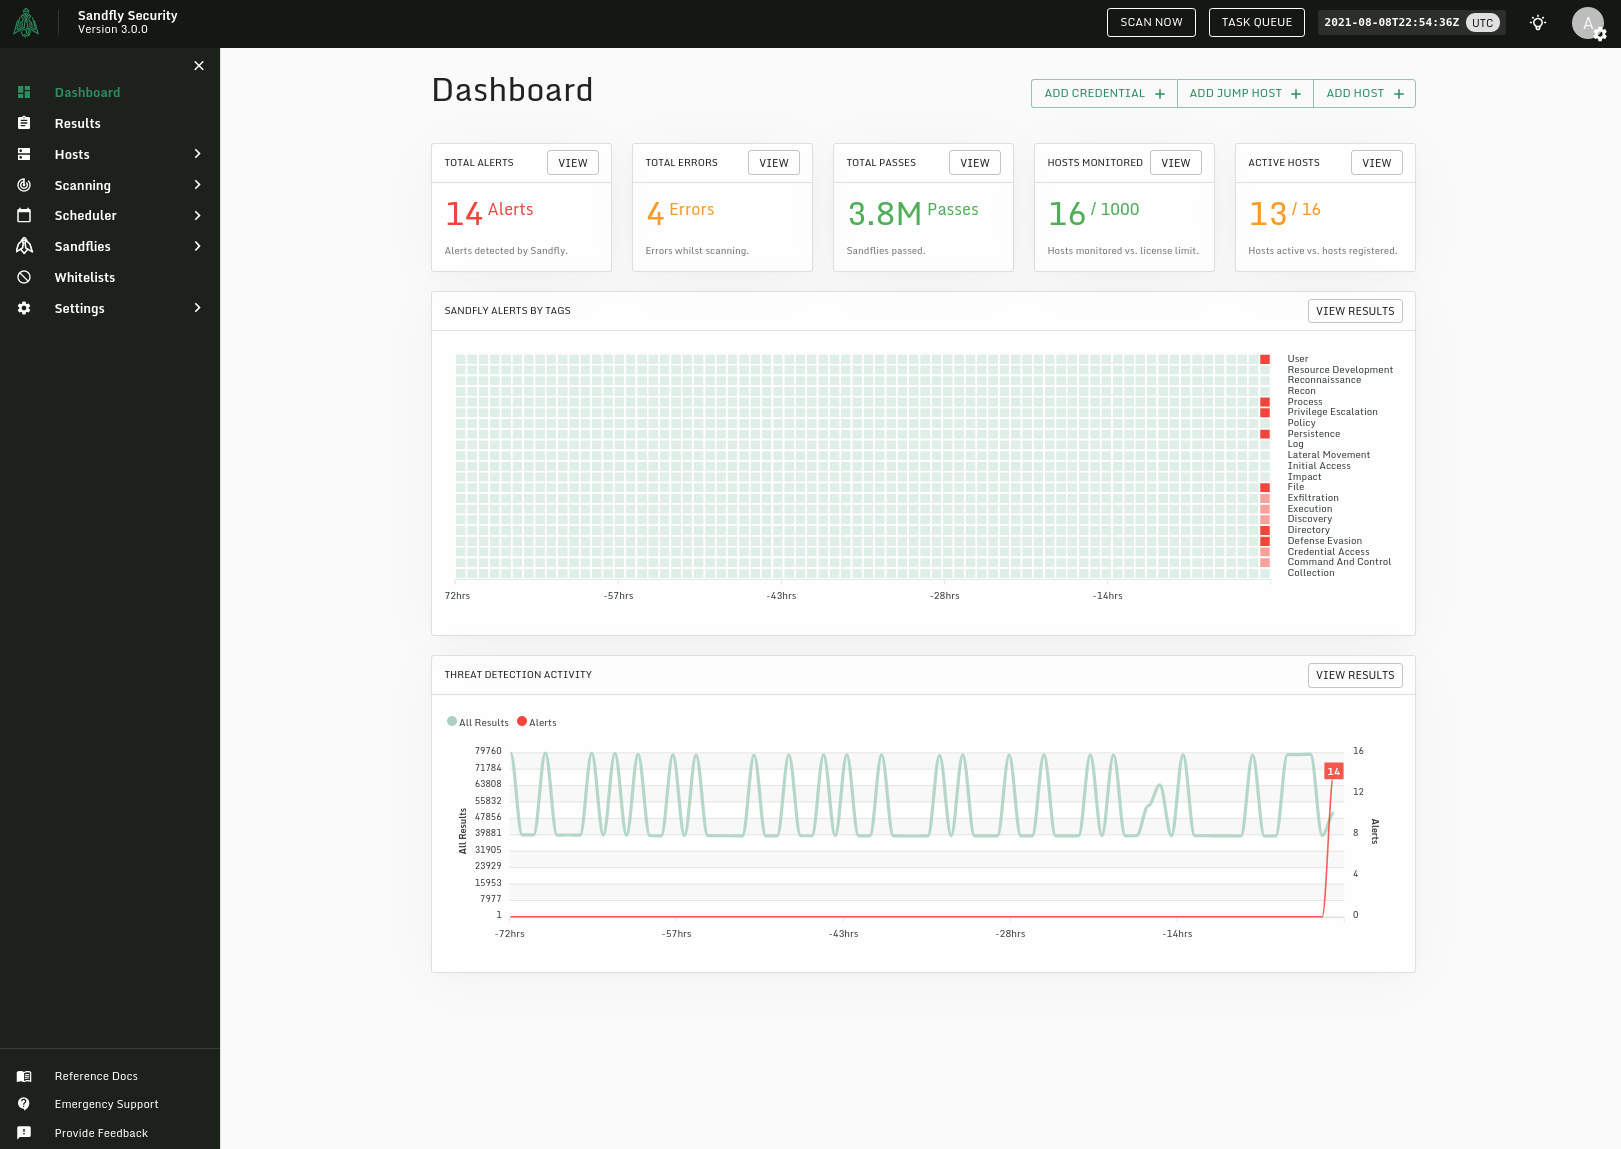 Sandfly User Interface